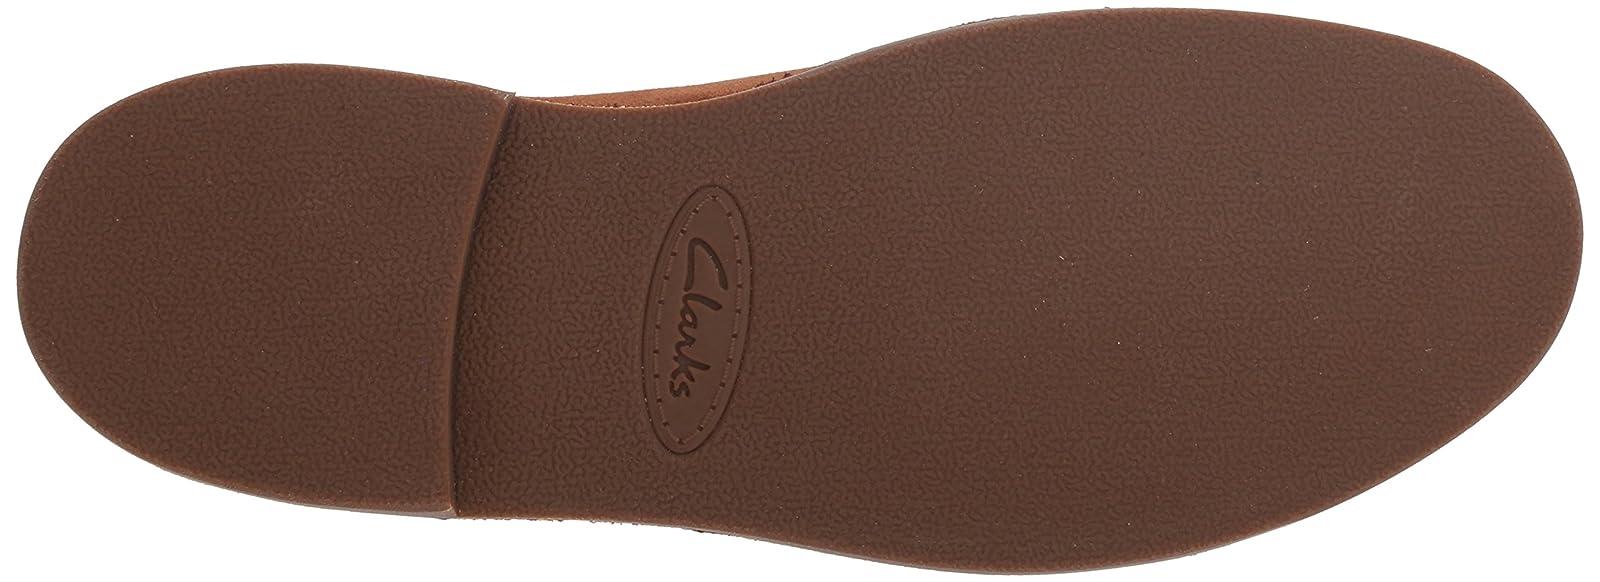 CLARKS Men's Bushacre Hill Chelsea Boot 8 M US Men - 3